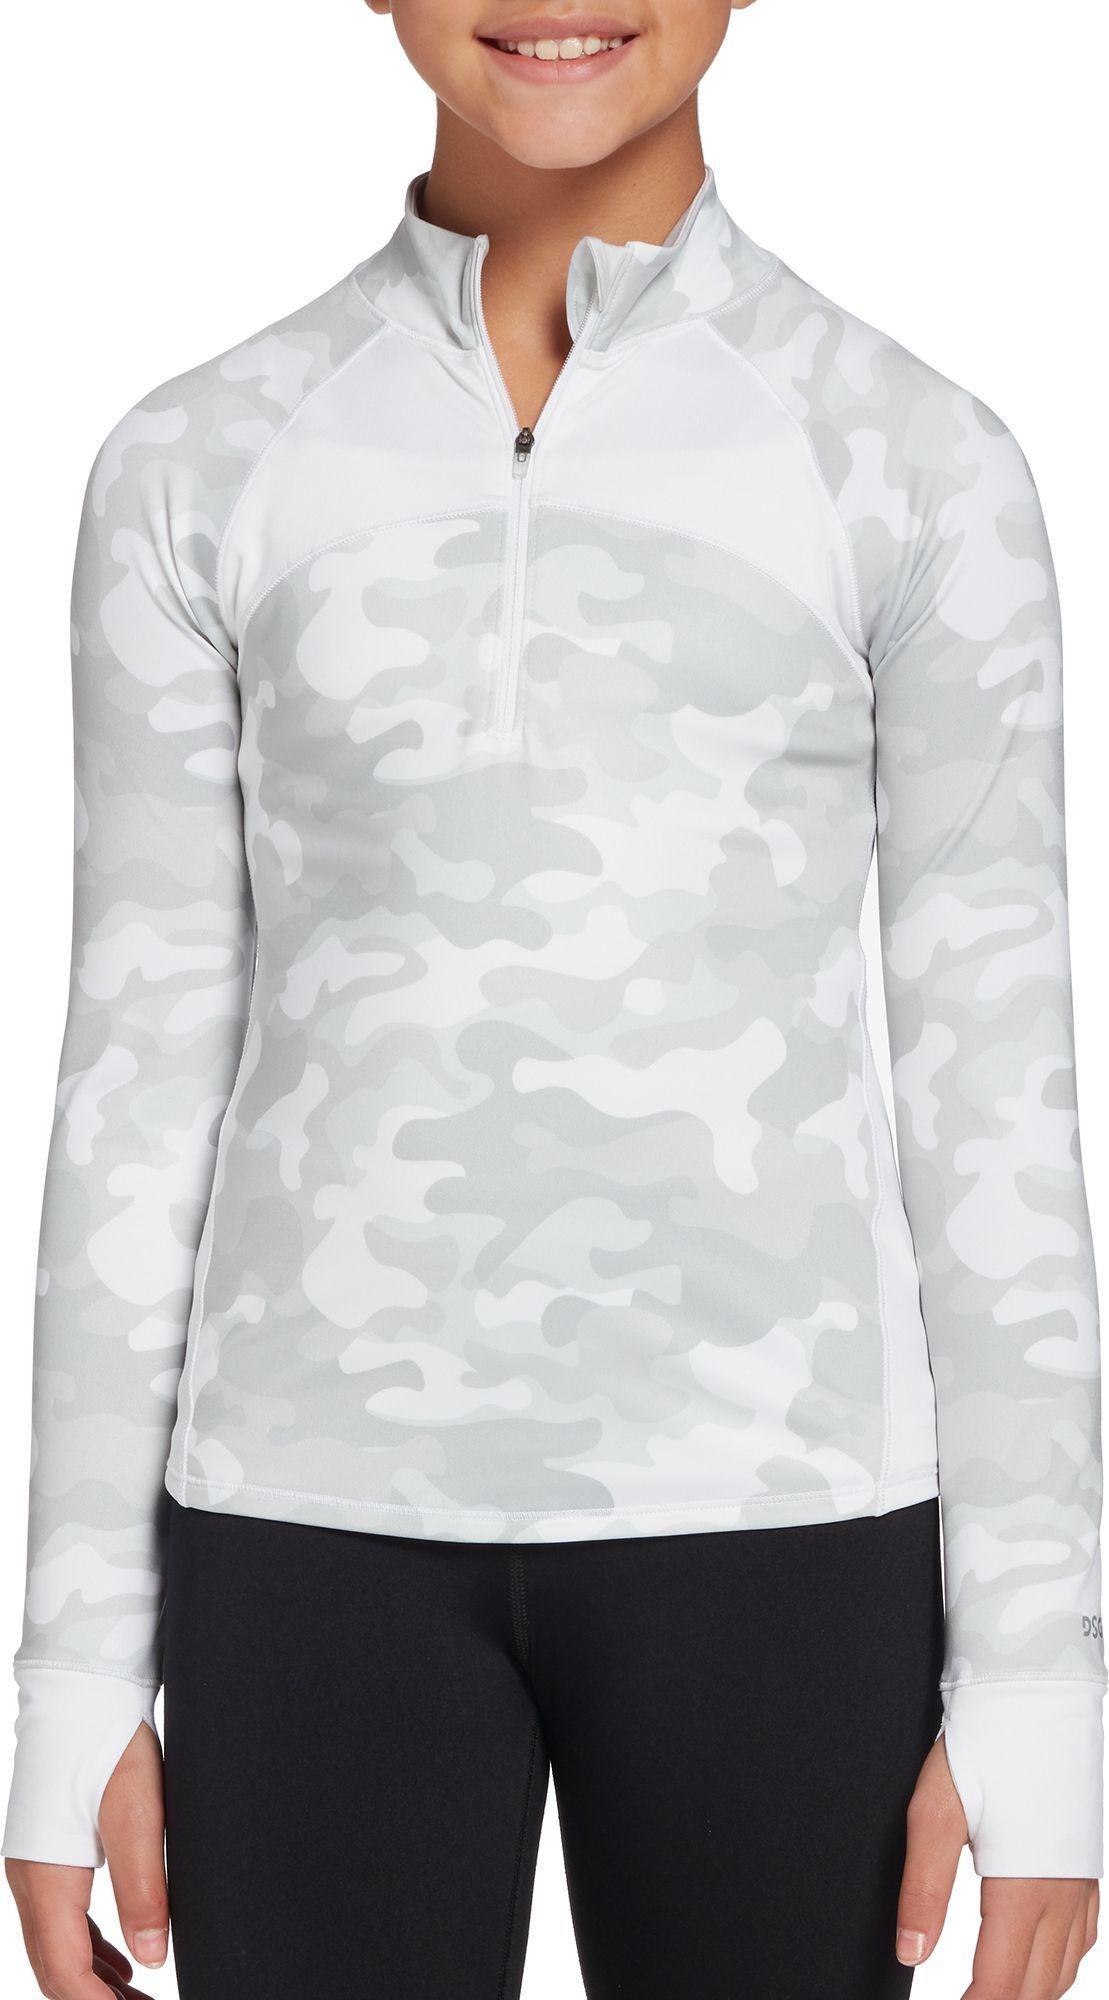 DSG Girls' CWC 1/4 Zip Jacket, XXS, Camo/pure White